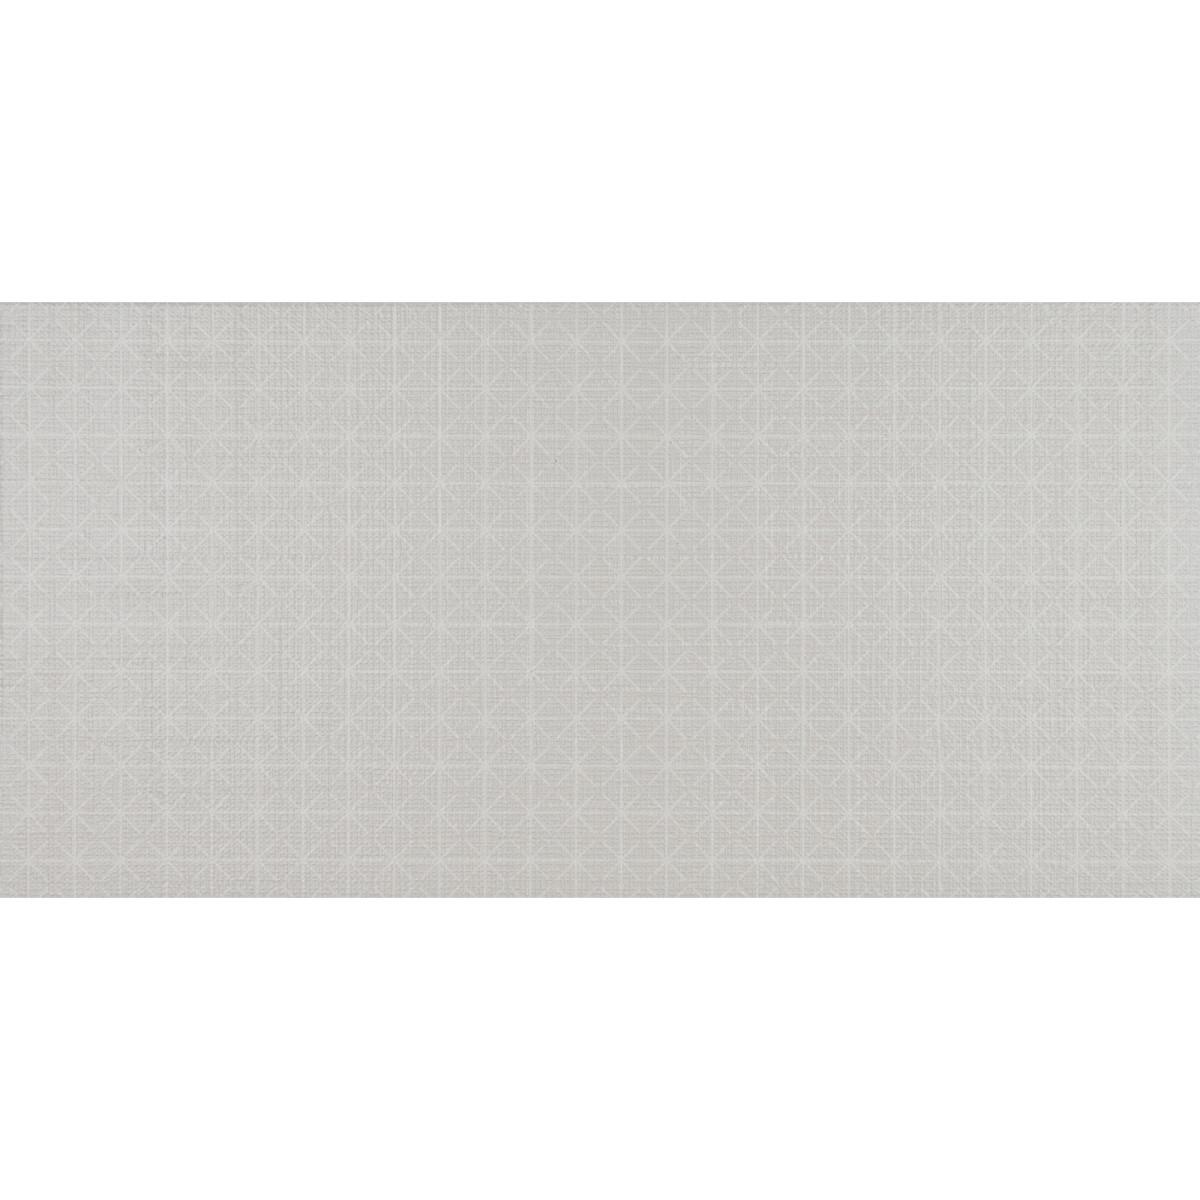 Керамогранит «Честер» 7Д 60x30 см 1.44 м² цвет серый